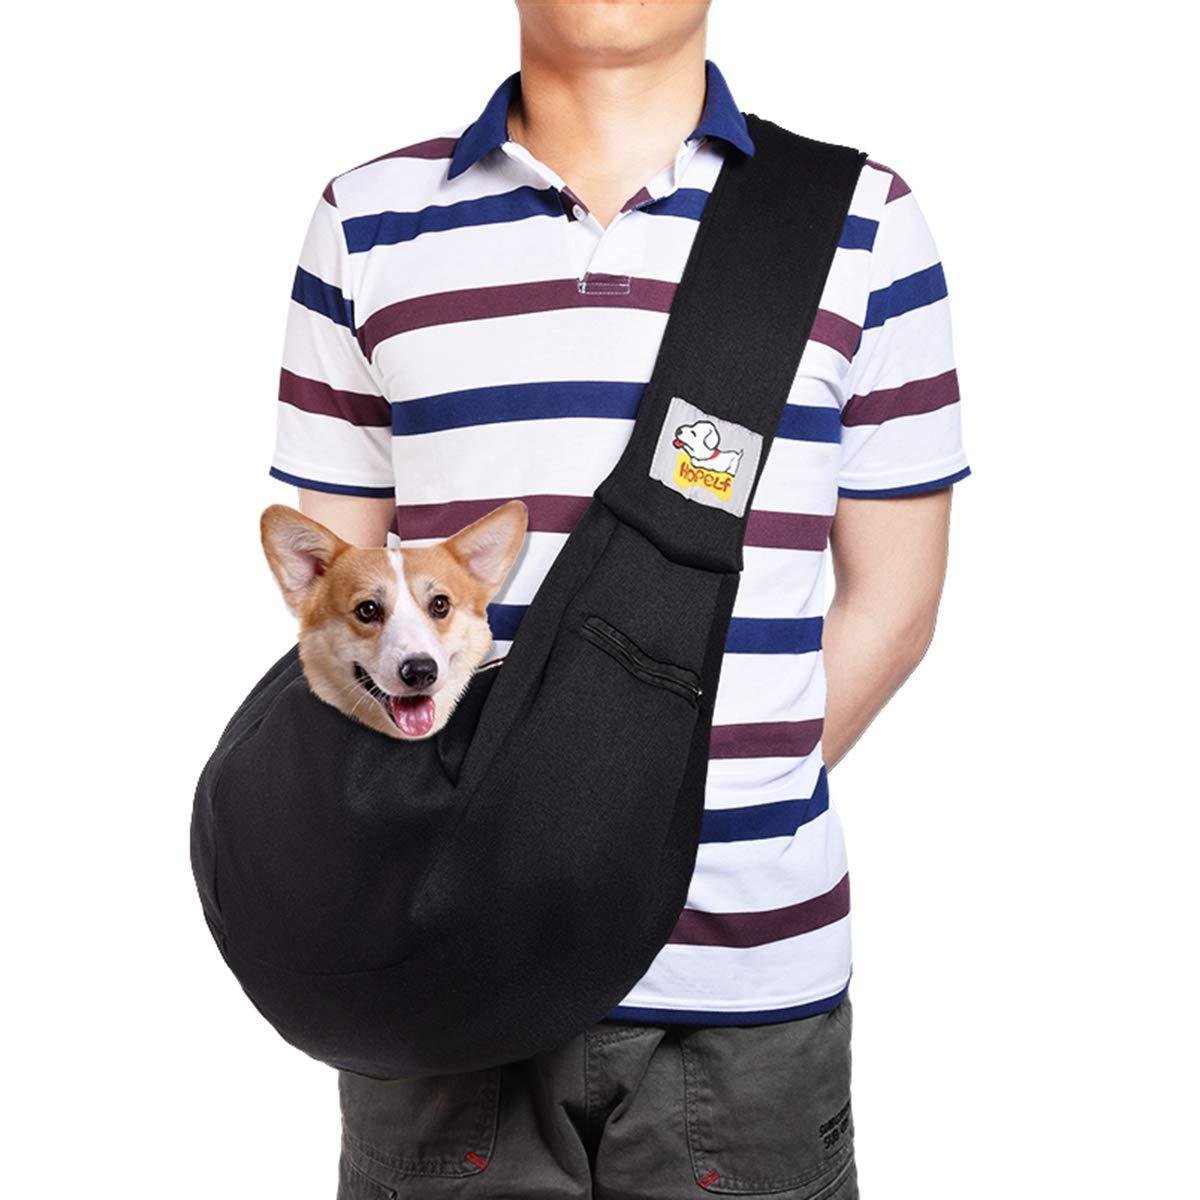 Black Adjustable HOPELF Reversible Pet Sling Carrier for Cats Dogs Comfortable Hands Free Puppy Outdoor Travel Bag (Black Adjustable)